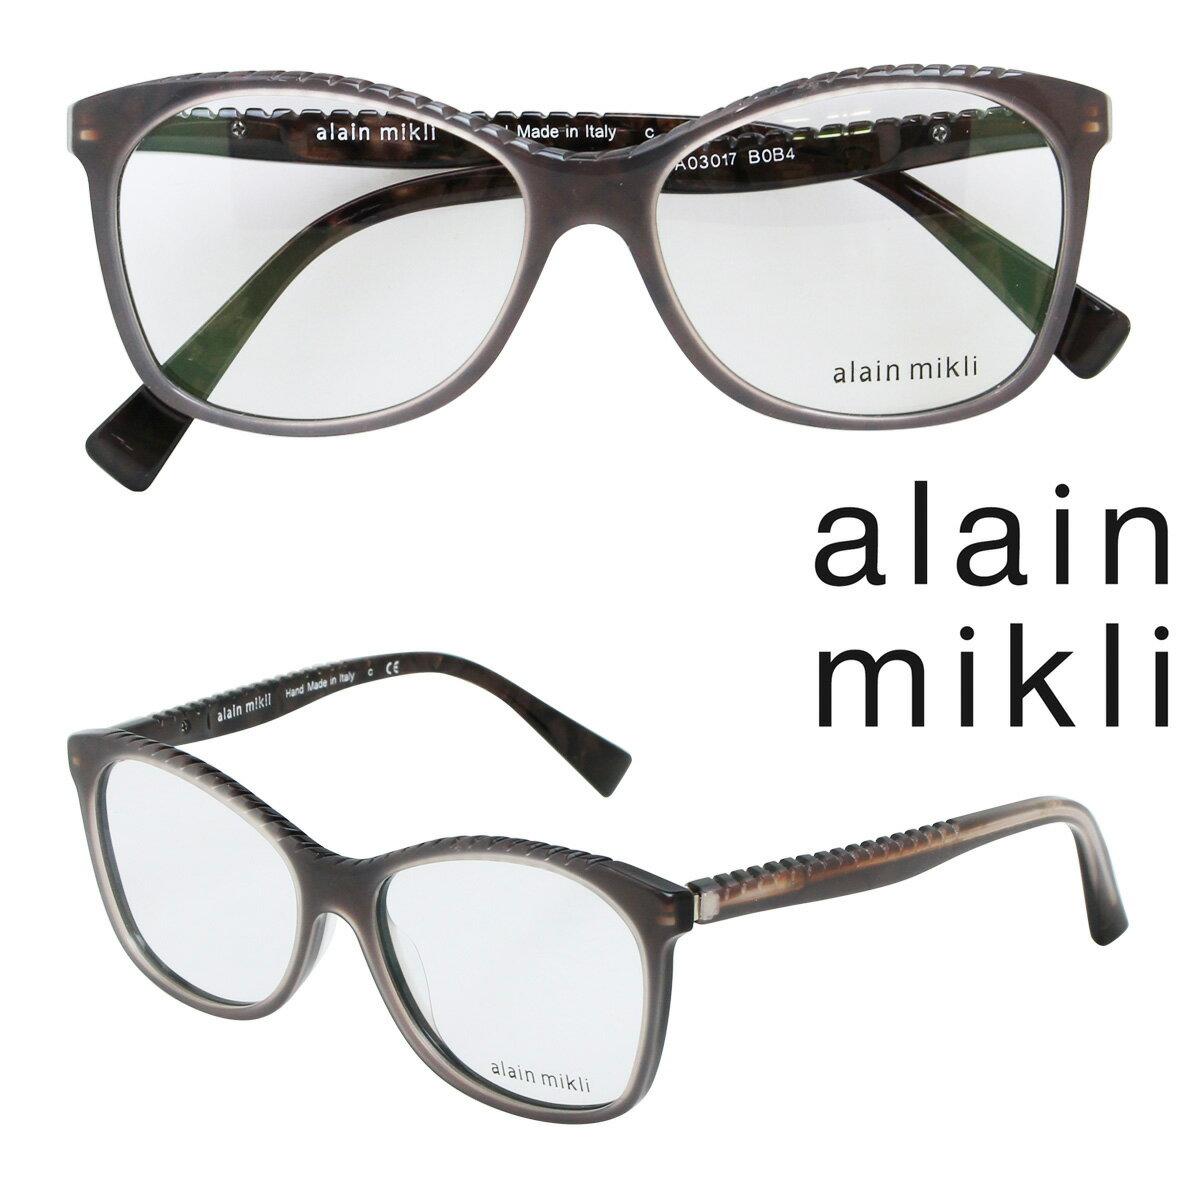 alain mikli アランミクリ メガネ 眼鏡 イタリア製 メンズ レディース 【返品不可】